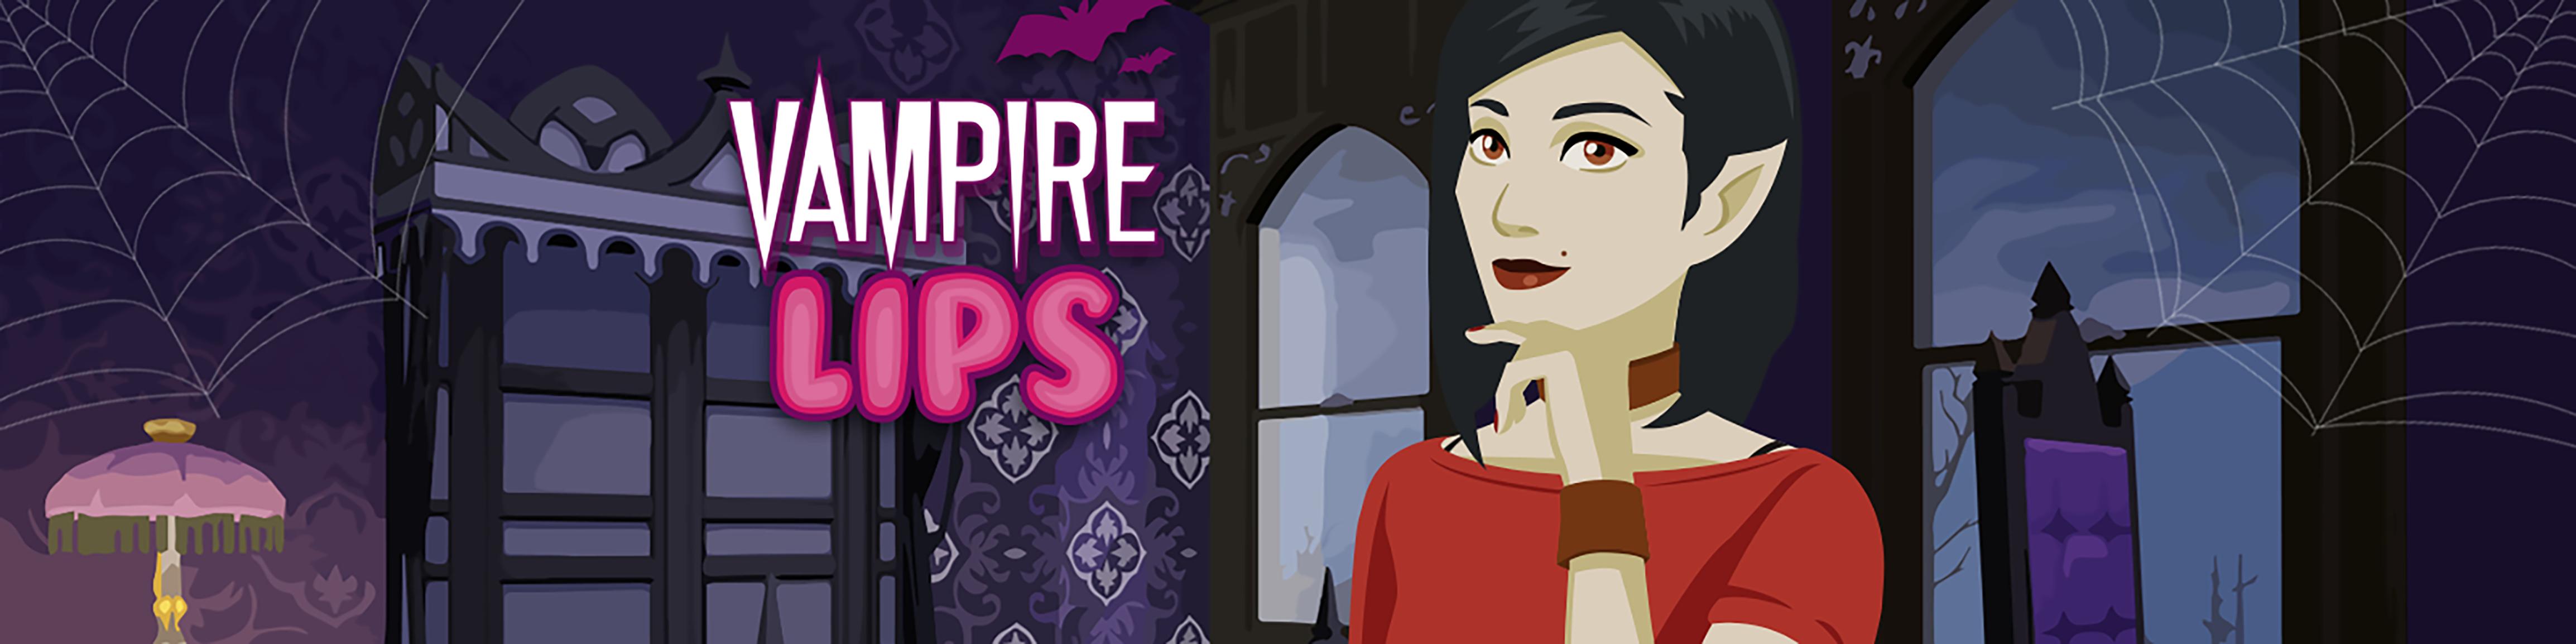 Vampire Lips (18+ Adult Visual Novel)